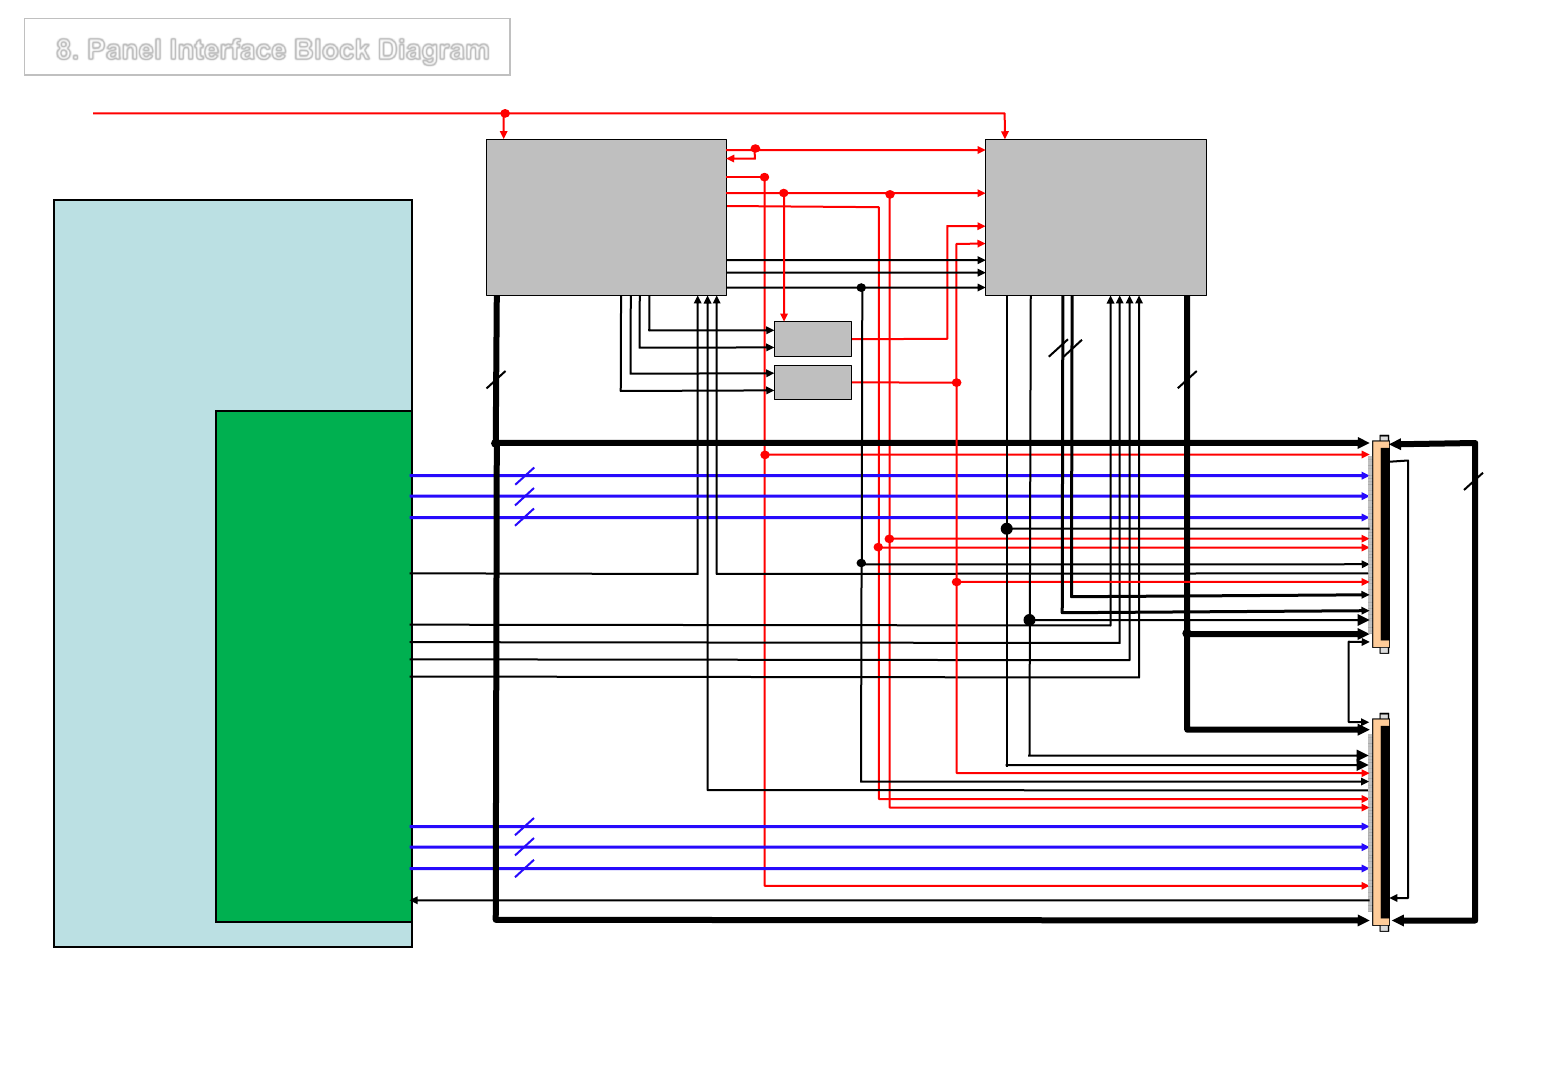 hight resolution of panel interface block diagram